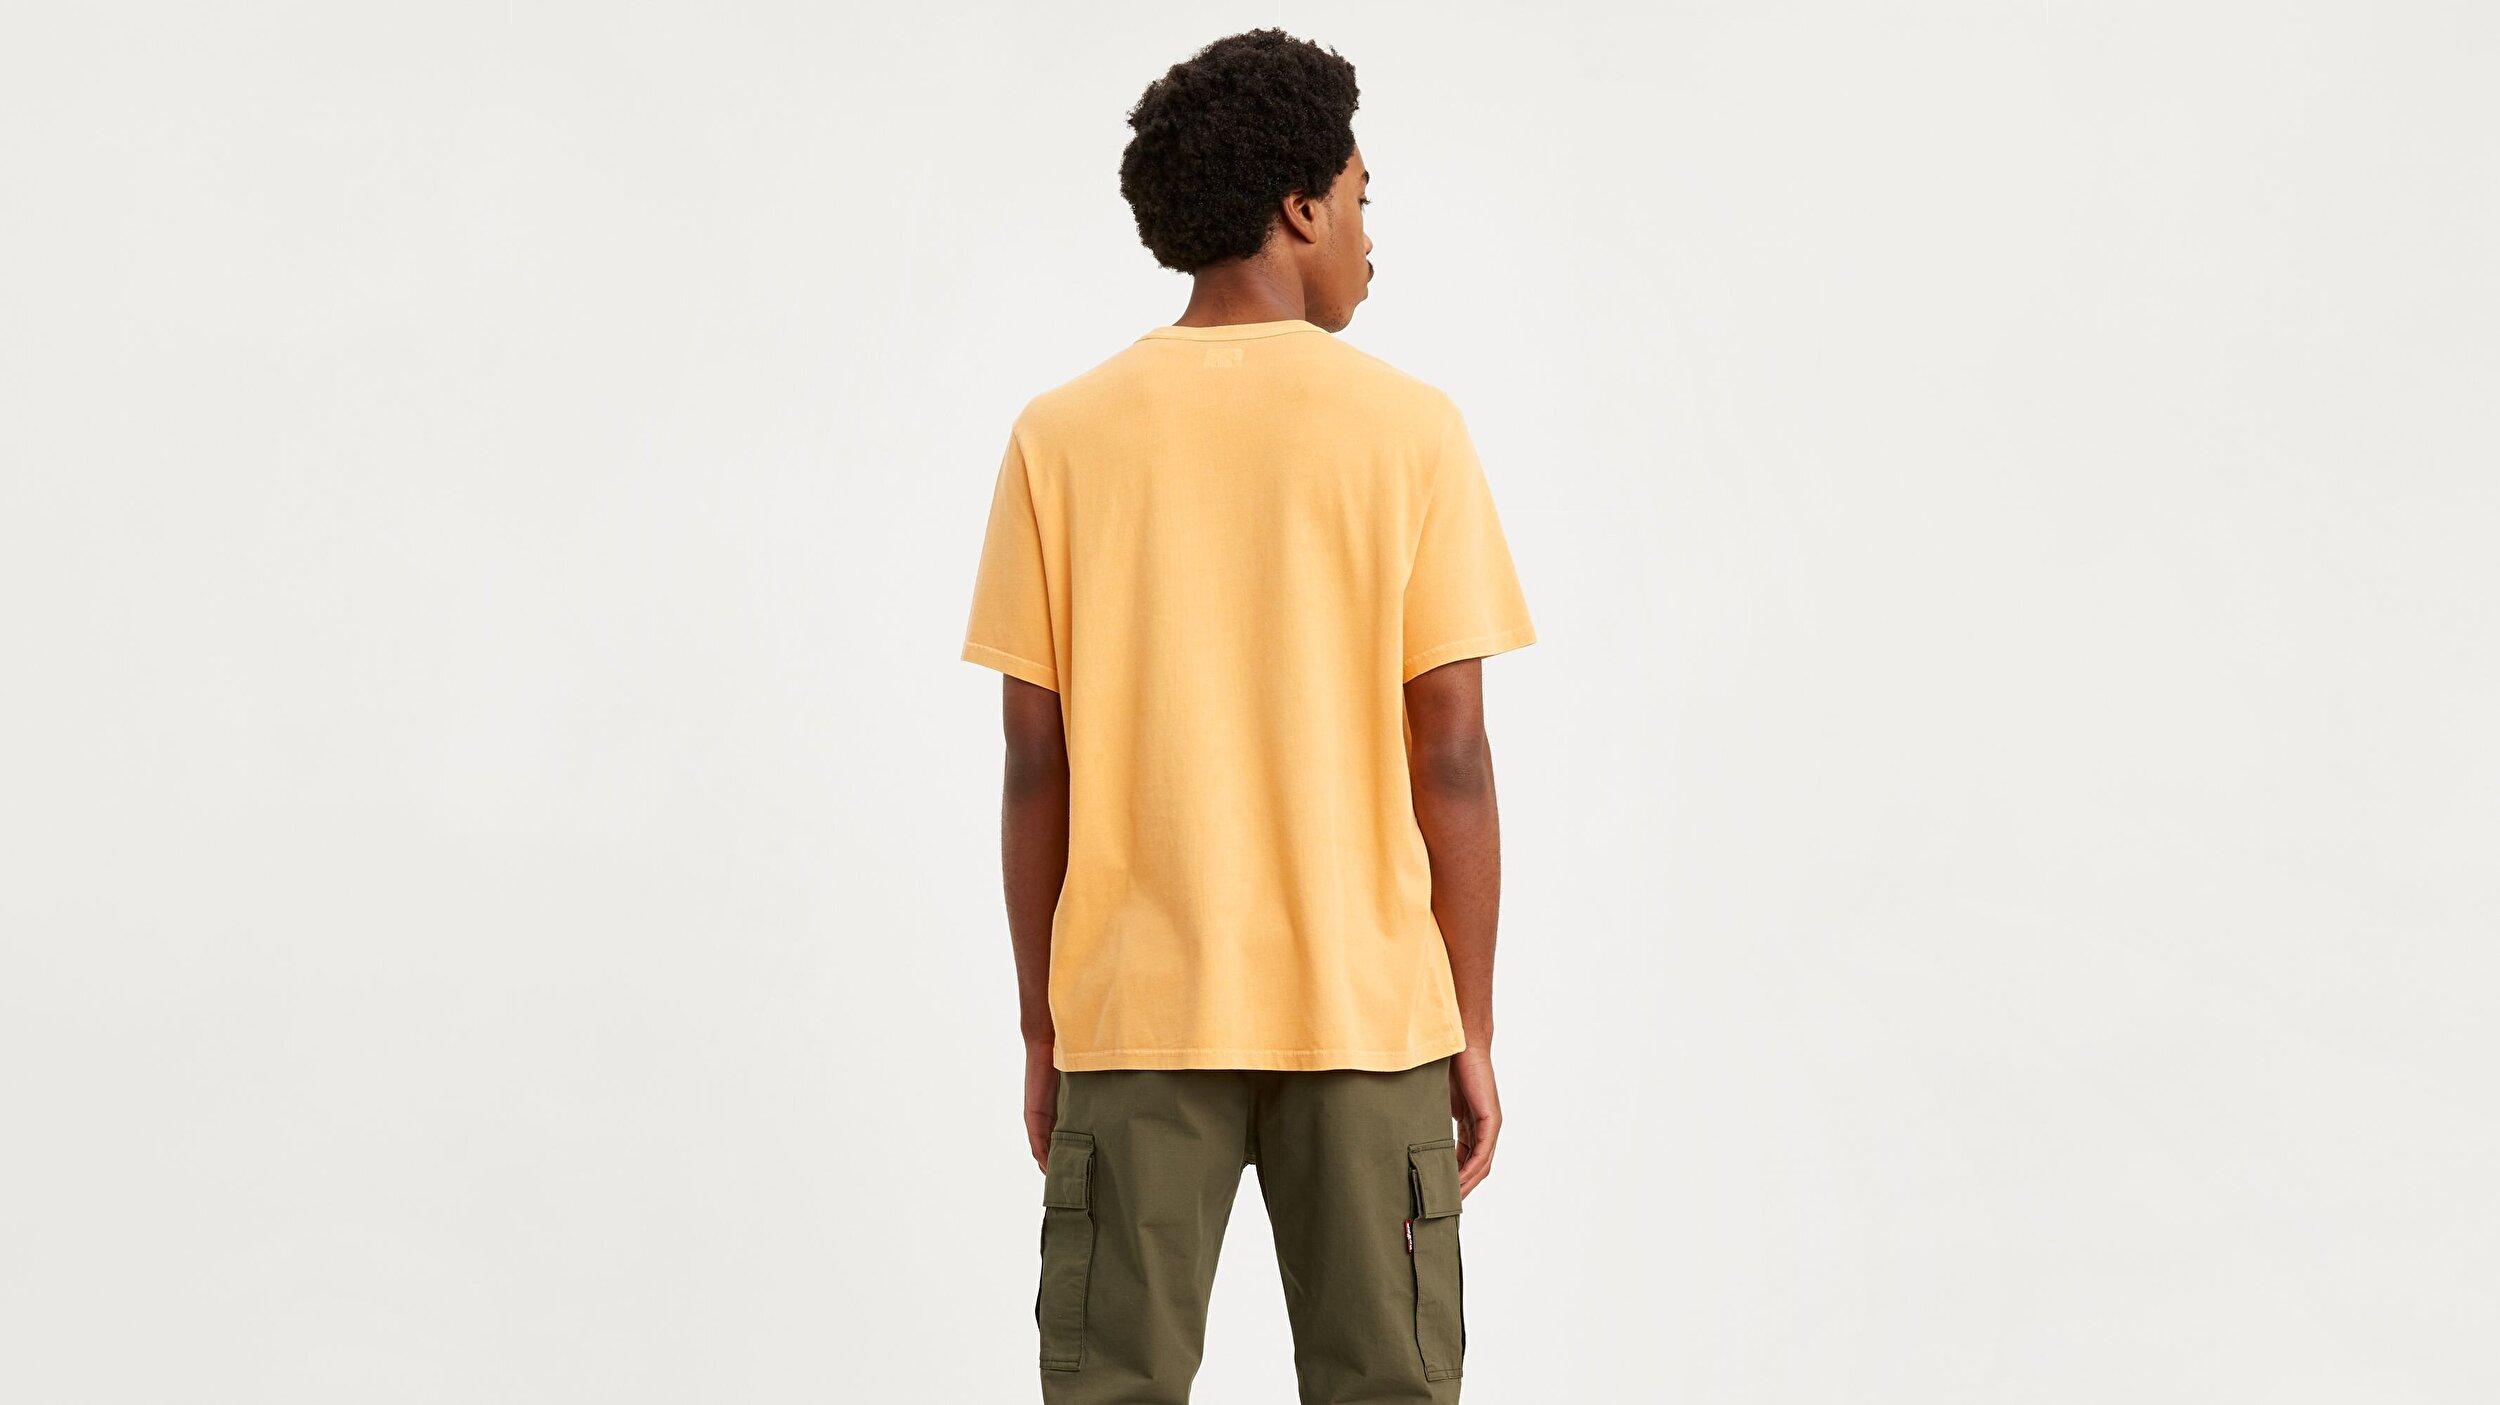 Authentic Crewneck Tee Golden Apricot sarı Erkek Tişört